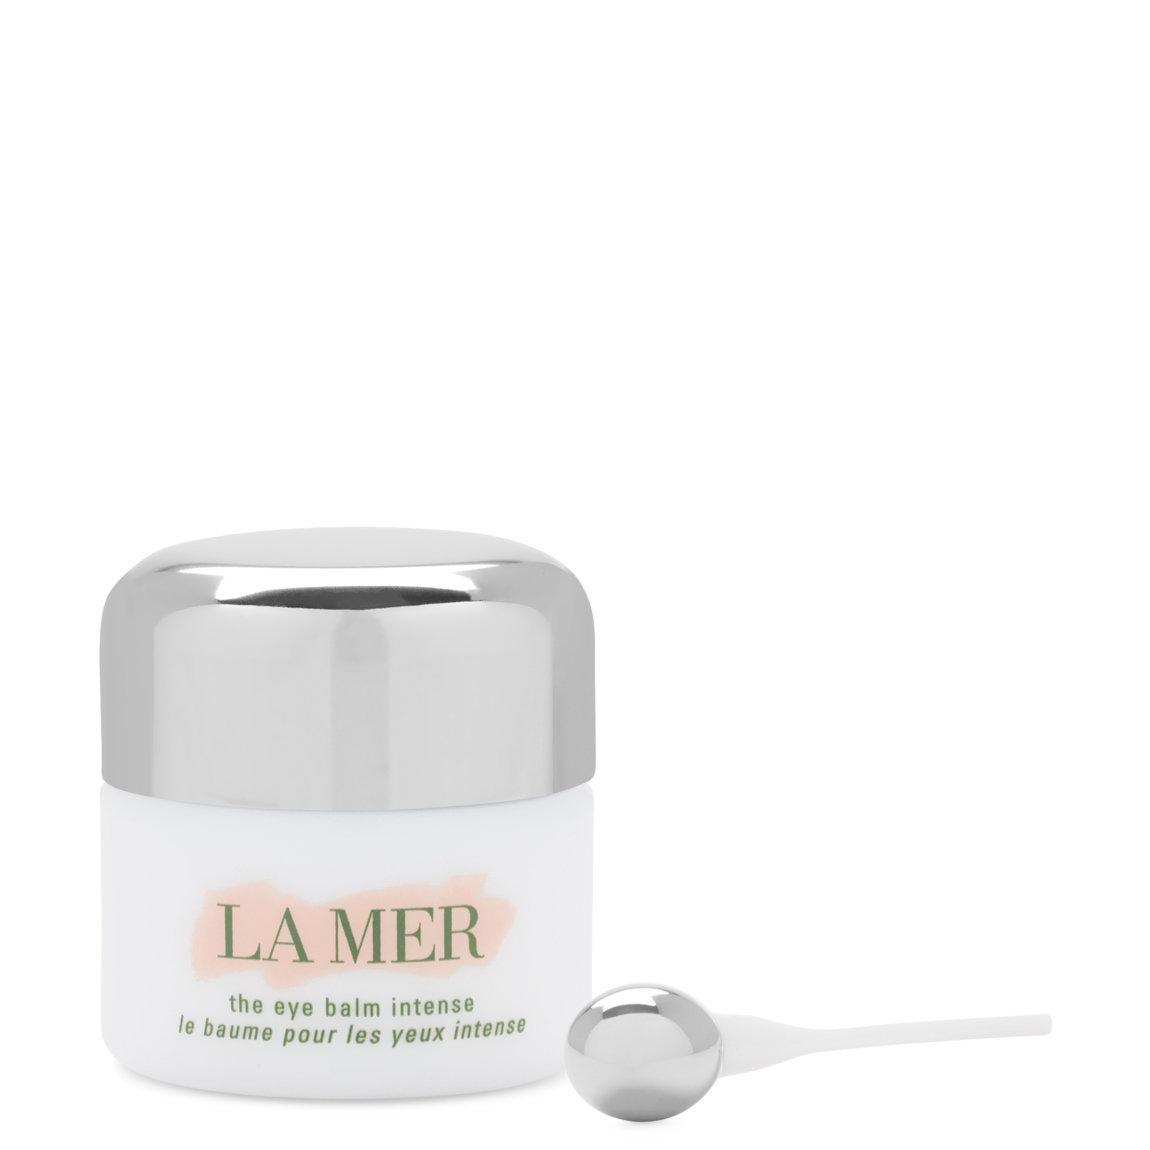 La Mer The Eye Balm Intense product swatch.